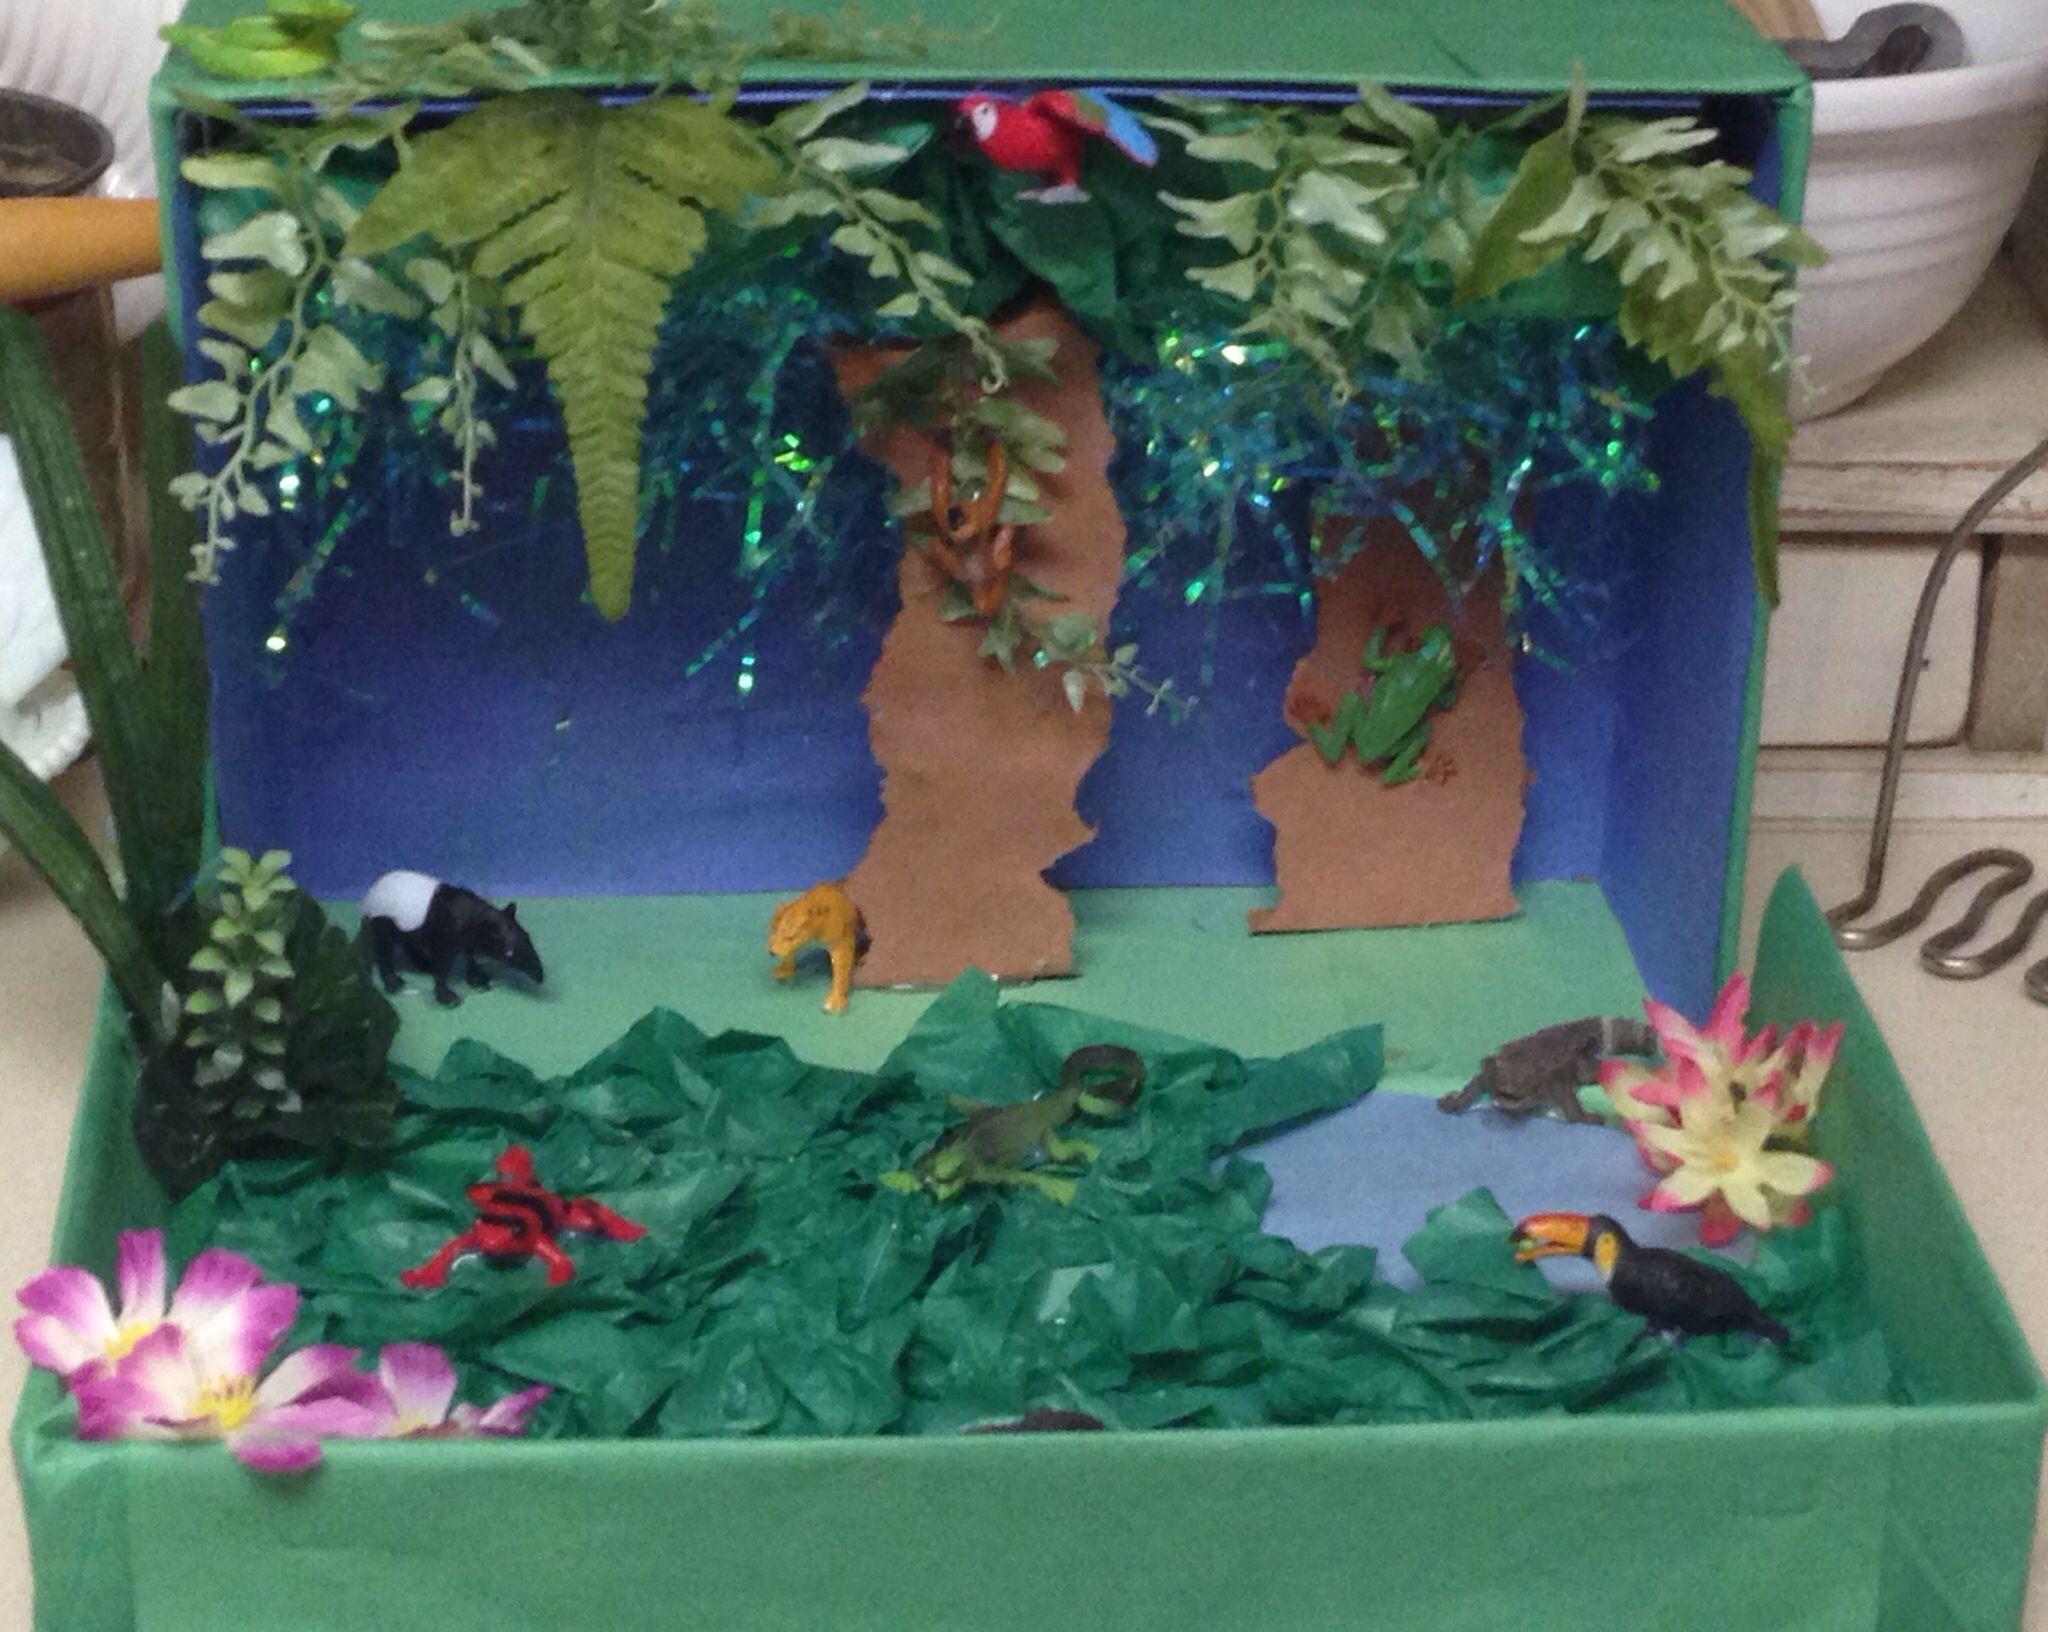 Kids Diorama With Details: Rainforest Diorama